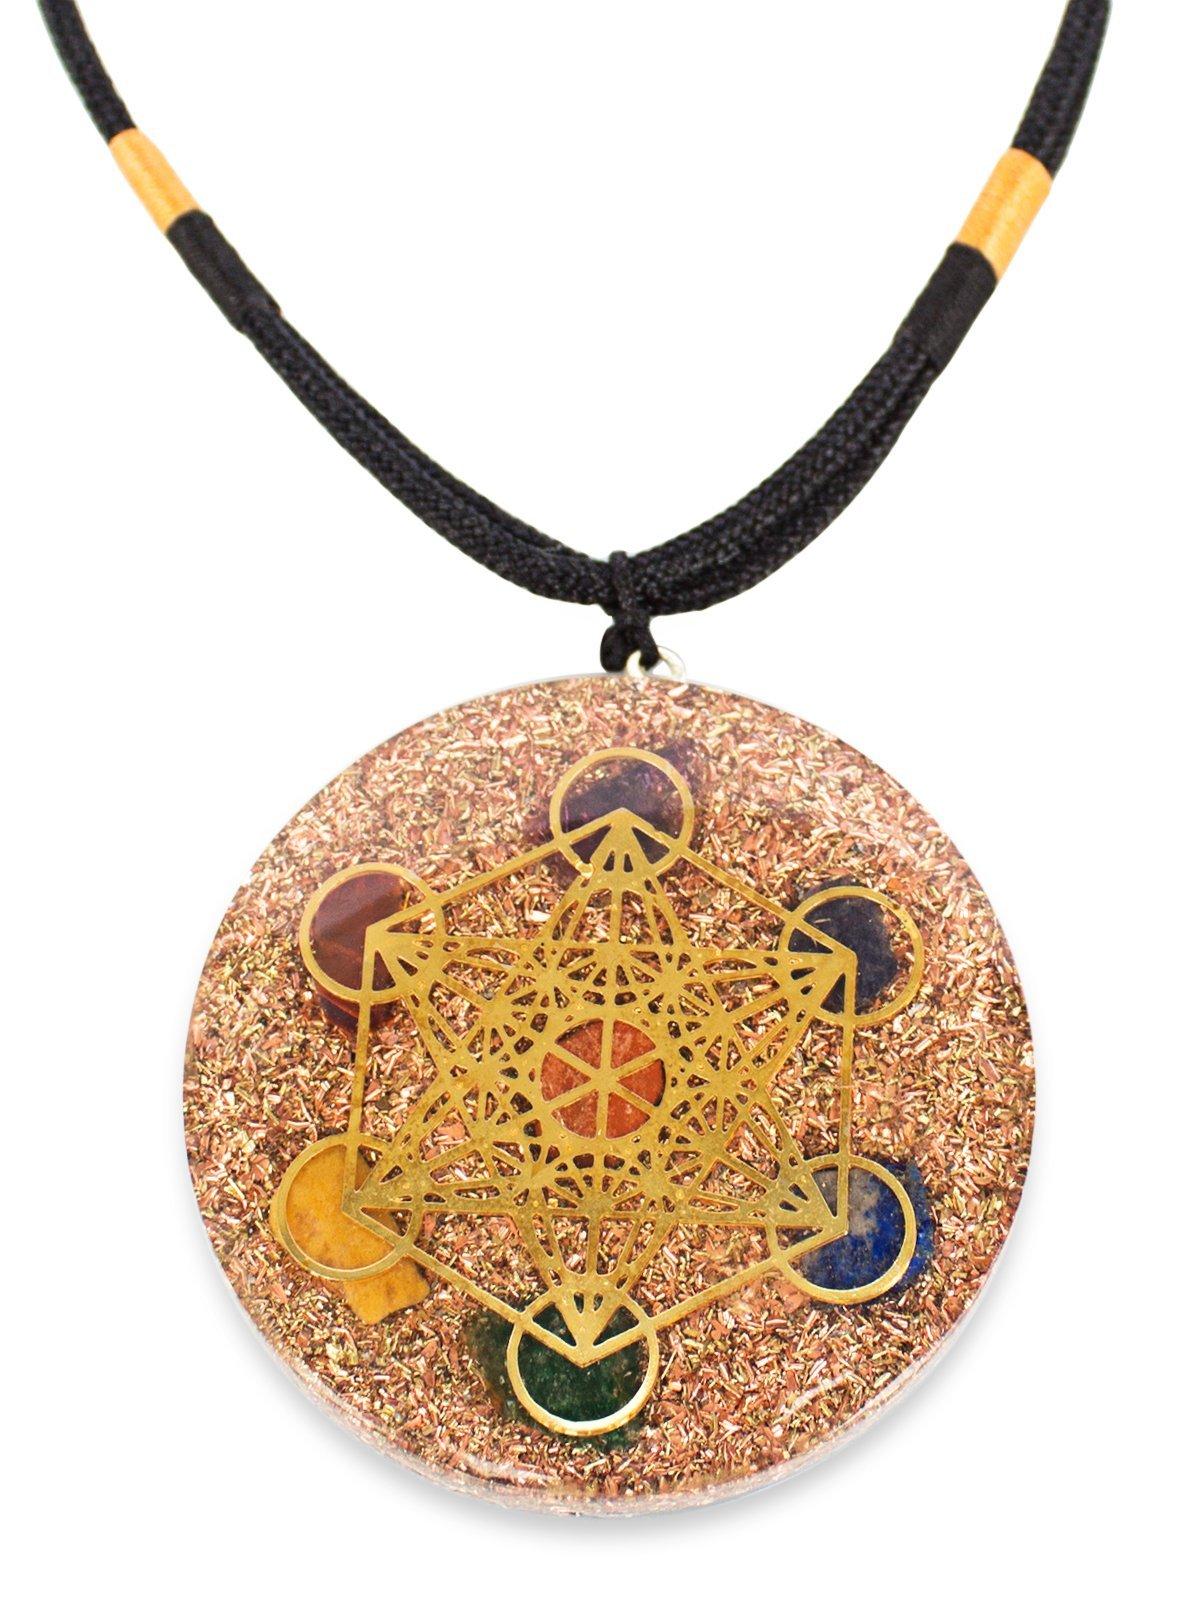 Reversible Orgonite Chakra Energy Web Merkaba 3 Chakra Orgone Pendant Generator – Revitalize Relax Chi-Lapis Lazuli, Carnelian Crystal necklace- Brass and Copper Tesla Coil Embedded